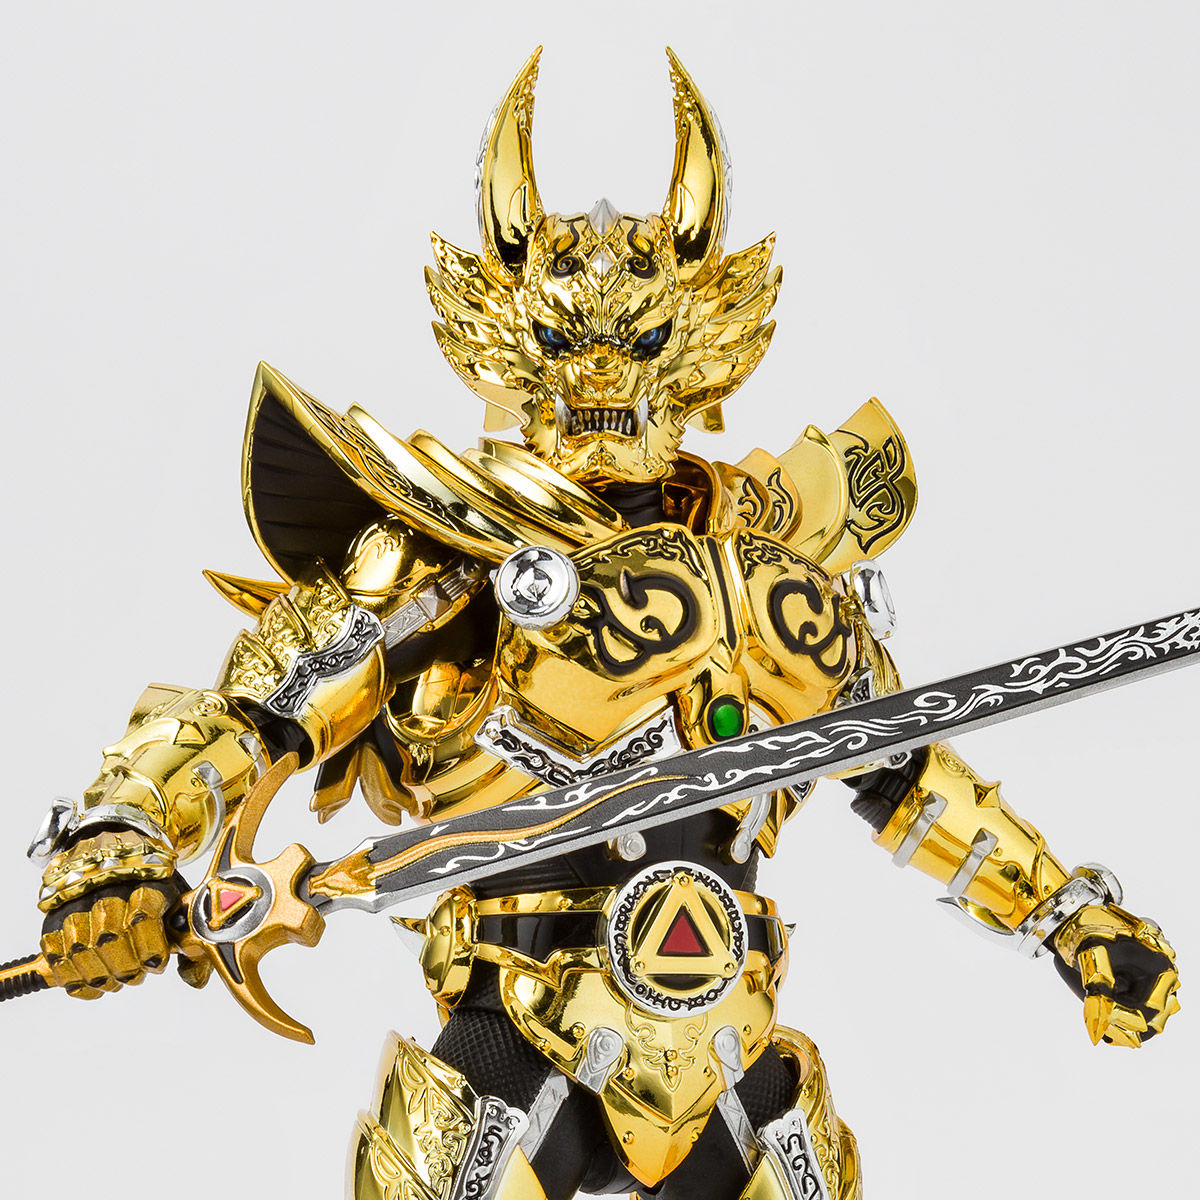 S.H.フィギュアーツ(真骨彫製法)『黄金騎士ガロ(冴島雷牙)』牙狼〈GARO〉可動フィギュア-001